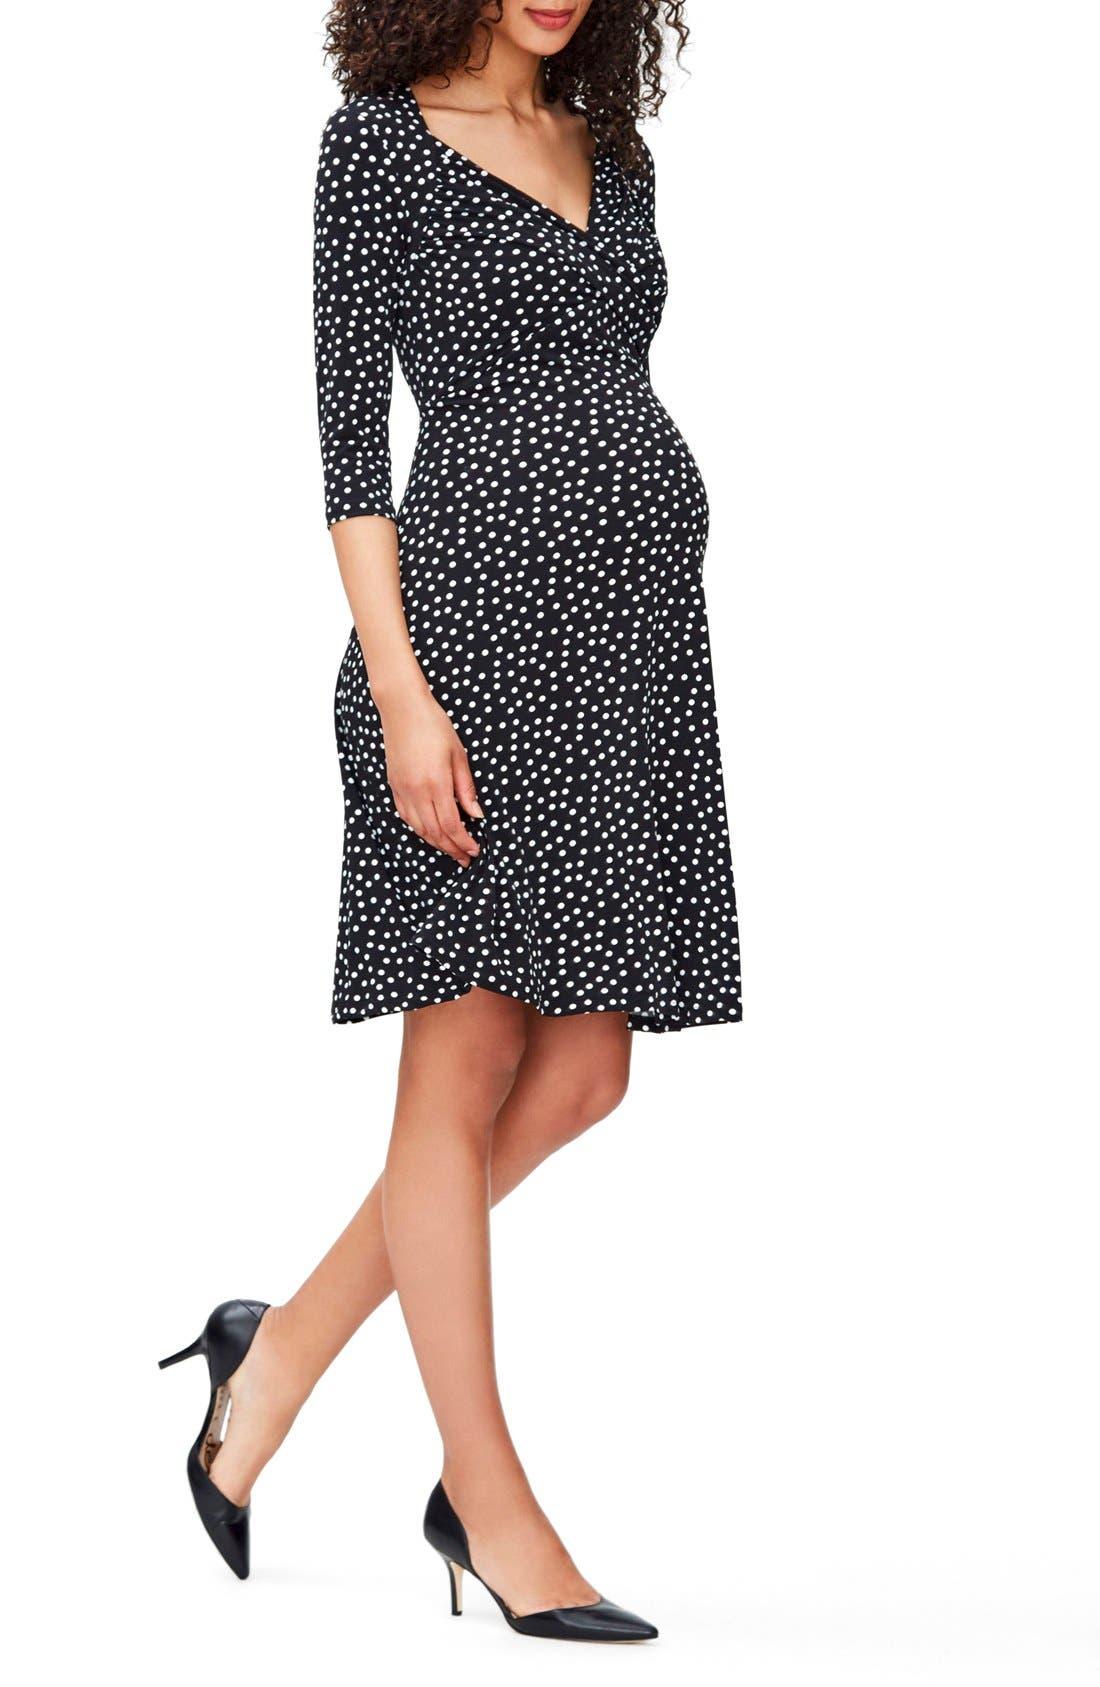 'Sweetheart' Maternity Dress,                             Main thumbnail 1, color,                             Black/ Ivory Confetti Dot